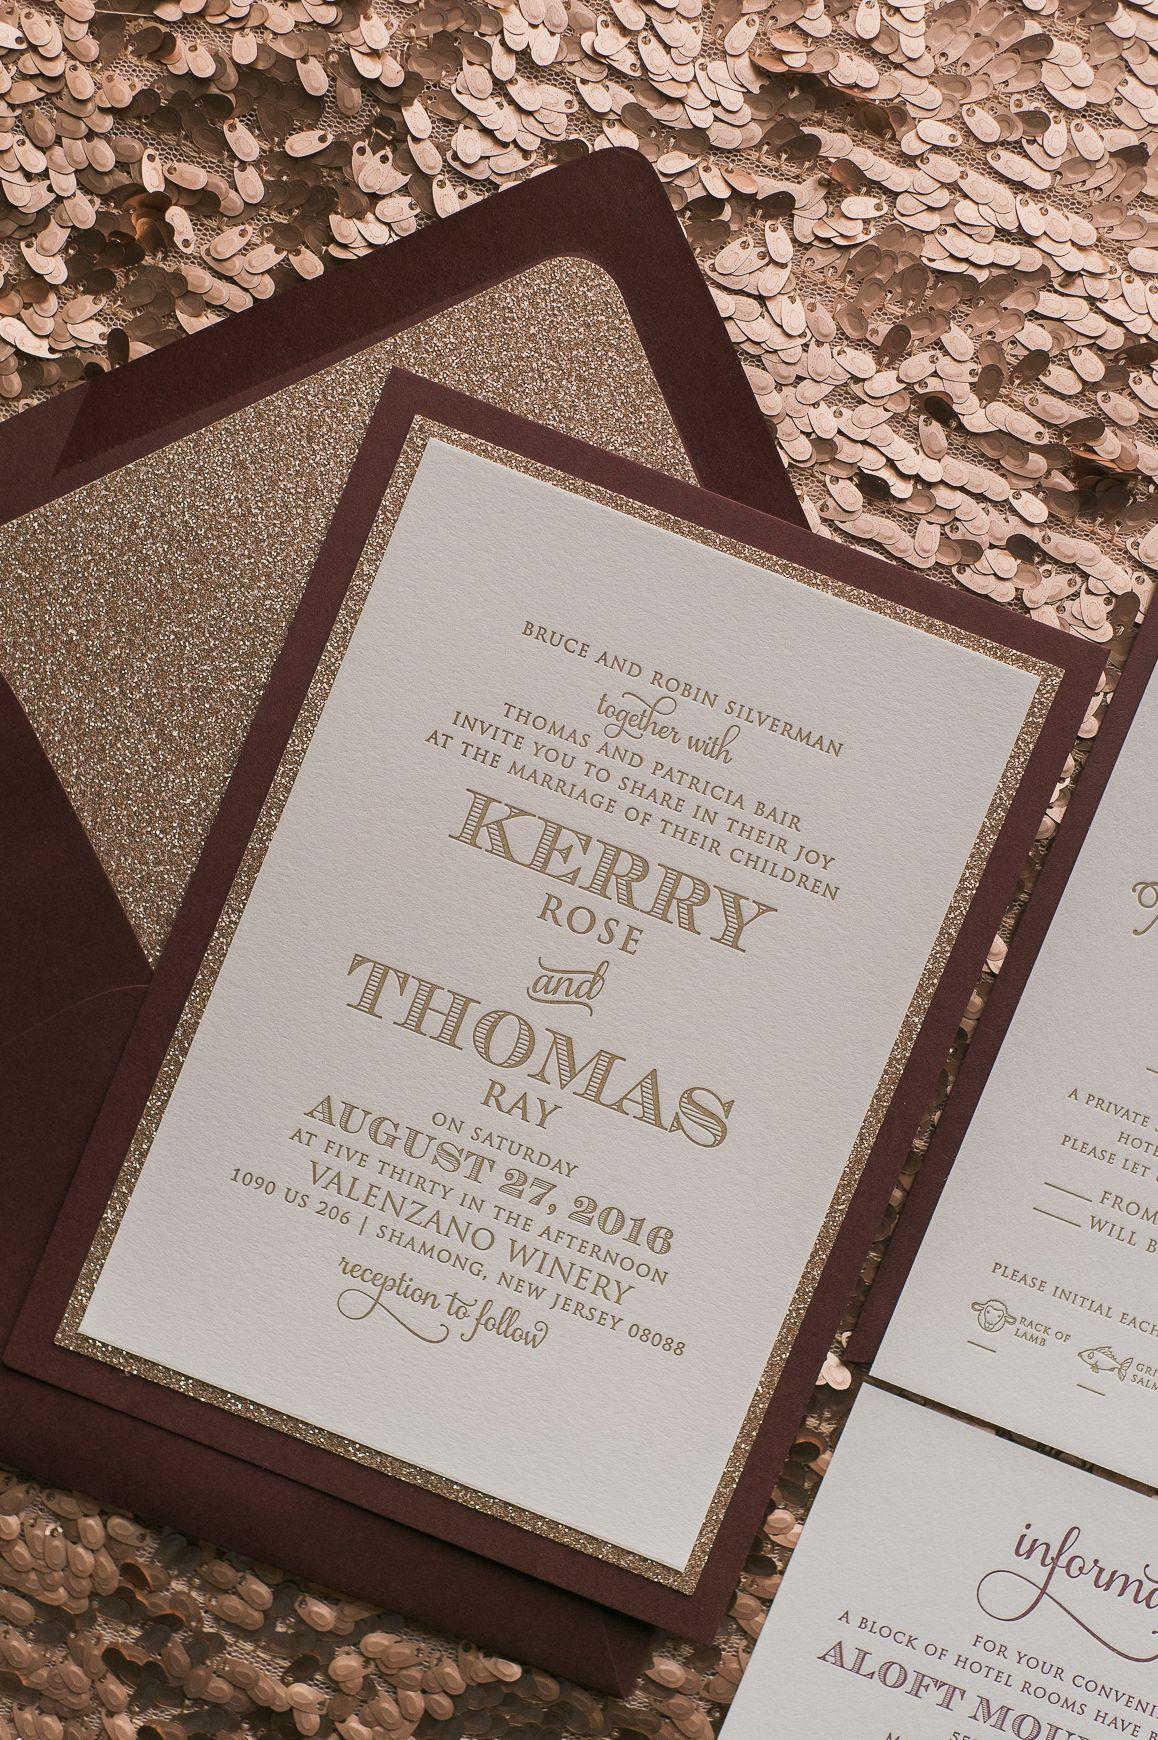 Real wedding kerry and thomas wedding invitation inspiration real wedding kerry and thomas fancy fall wedding invitation inspiration with rose gold glitter monicamarmolfo Image collections